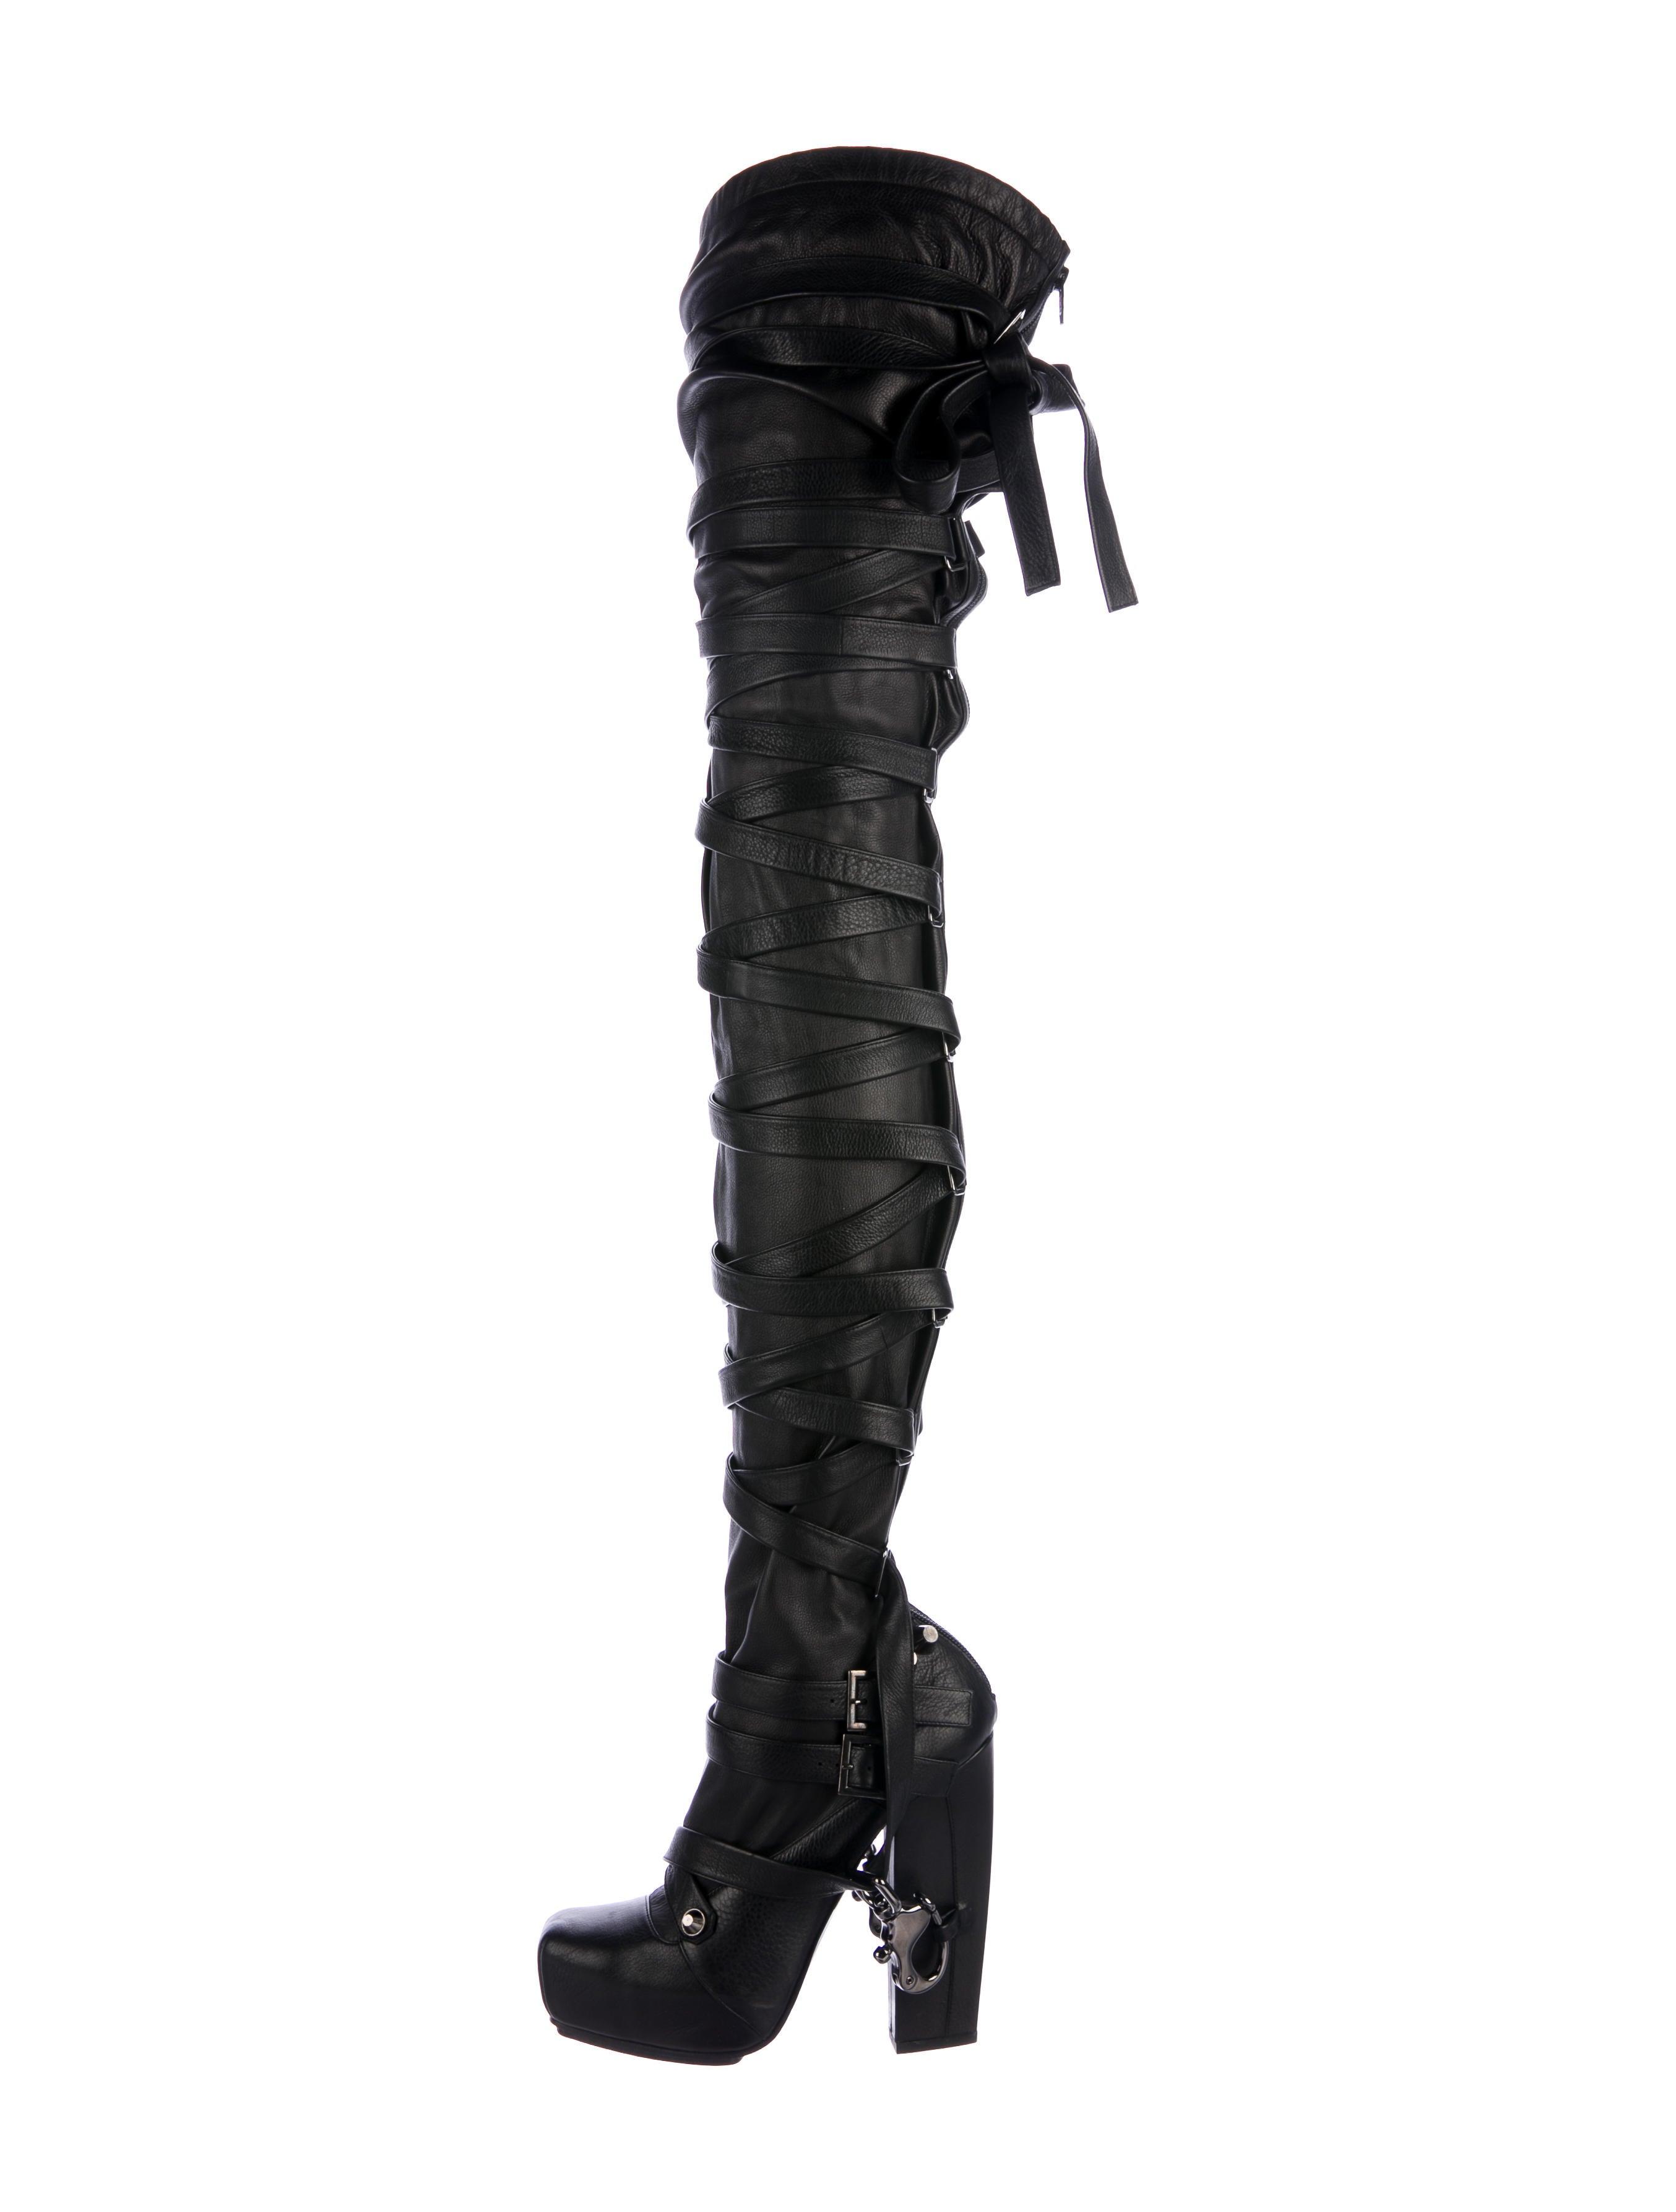 09608cbed87a Nicholas Kirkwood x Rodarte Bondage Thigh-High Boots - Shoes ...